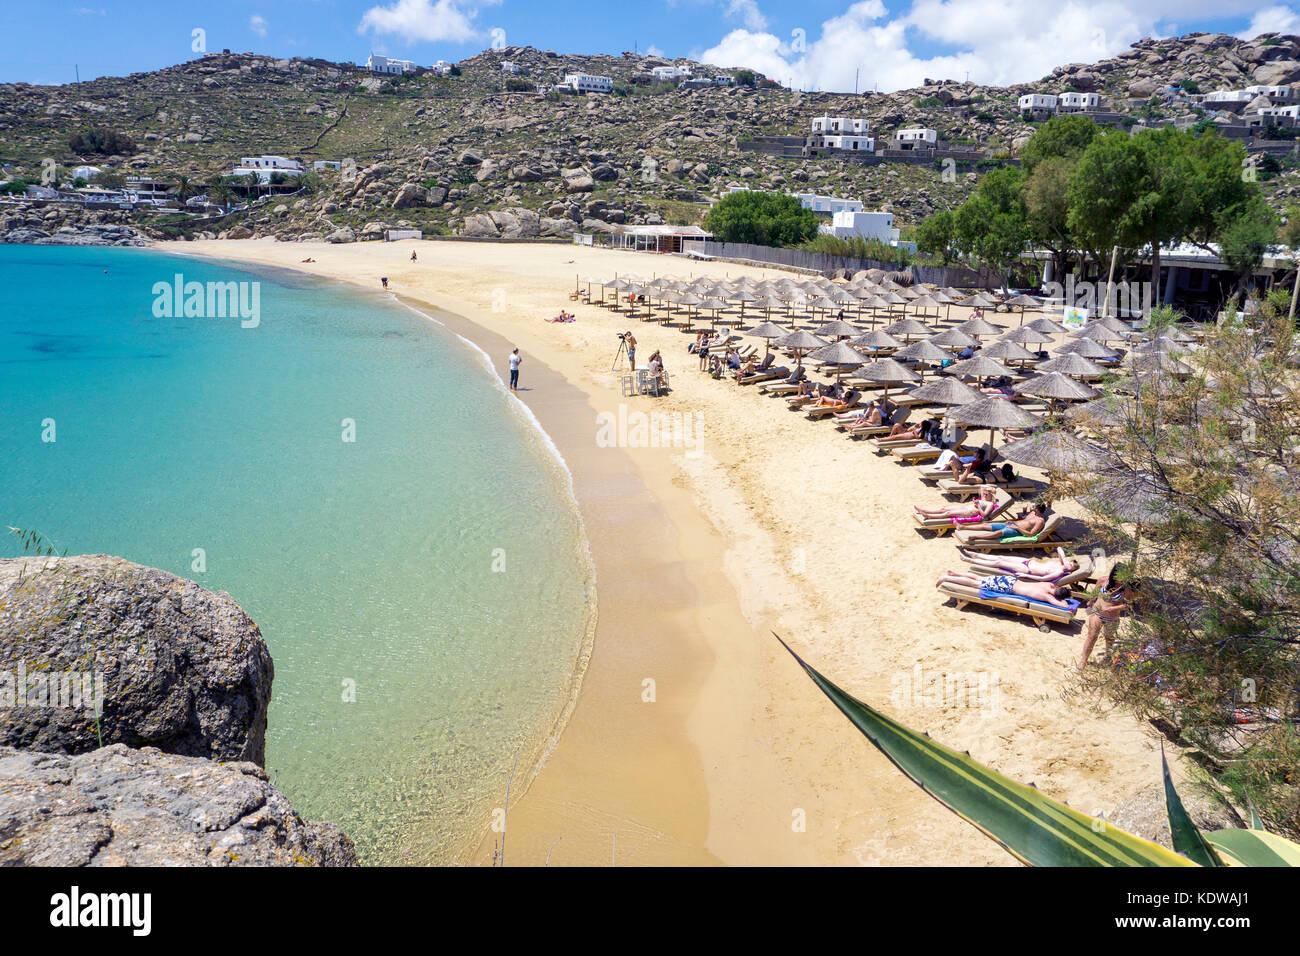 Best Island Beaches For Partying Mykonos St Barts: Mykonos Super Paradise Beach Stock Photos & Mykonos Super